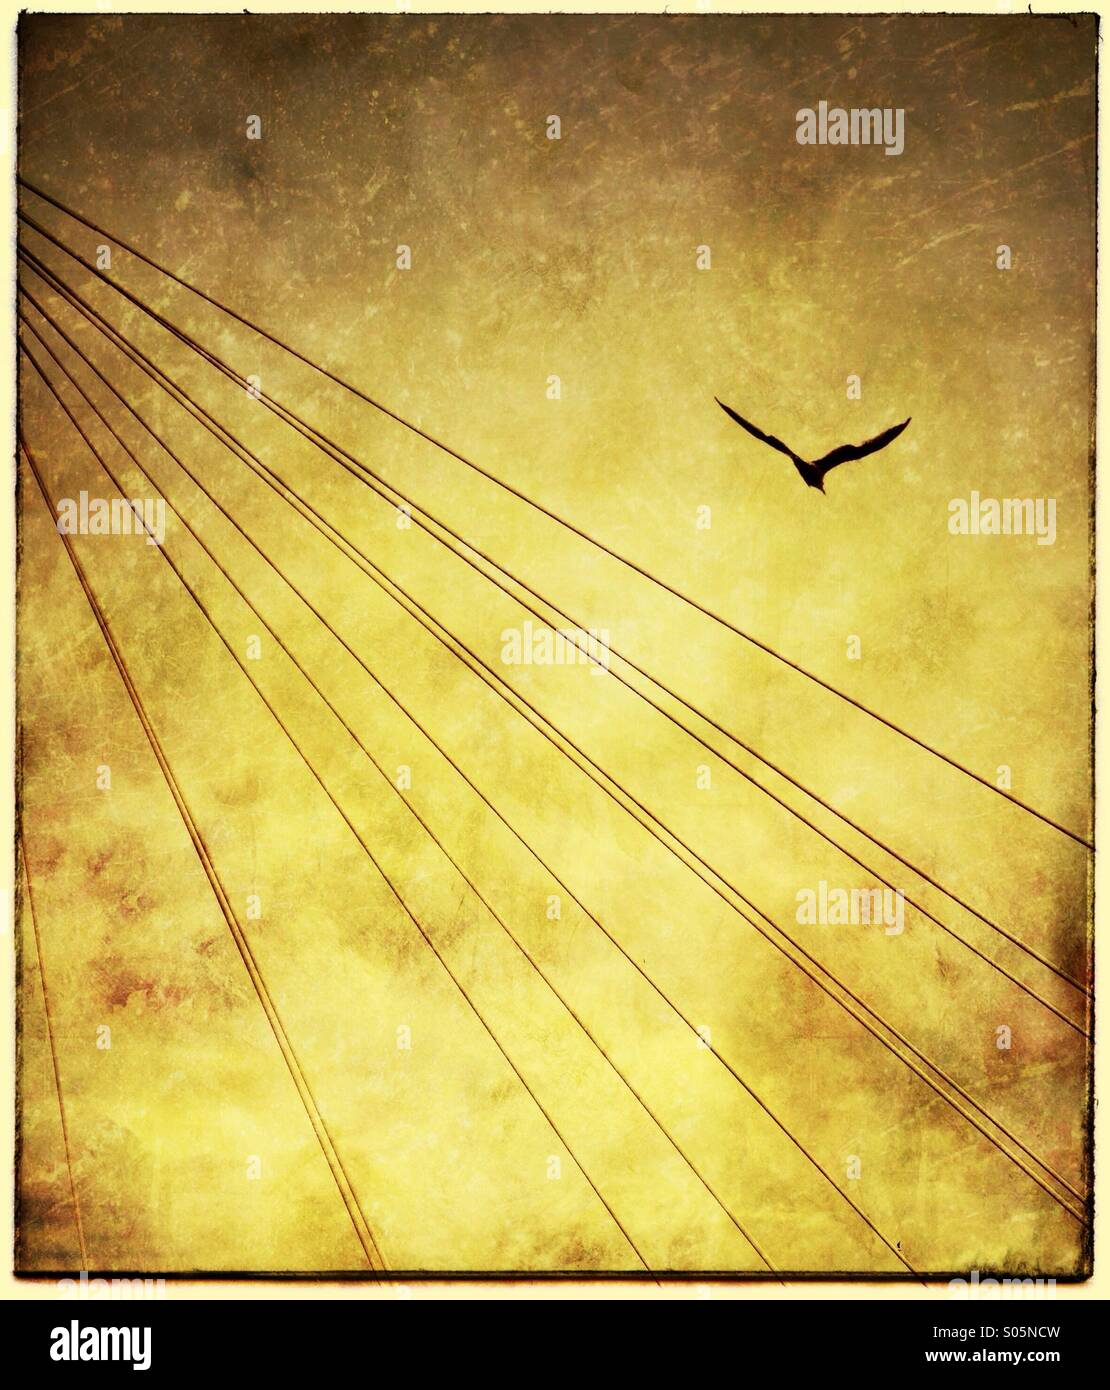 suspension-bridge-cables-and-seagull-S05